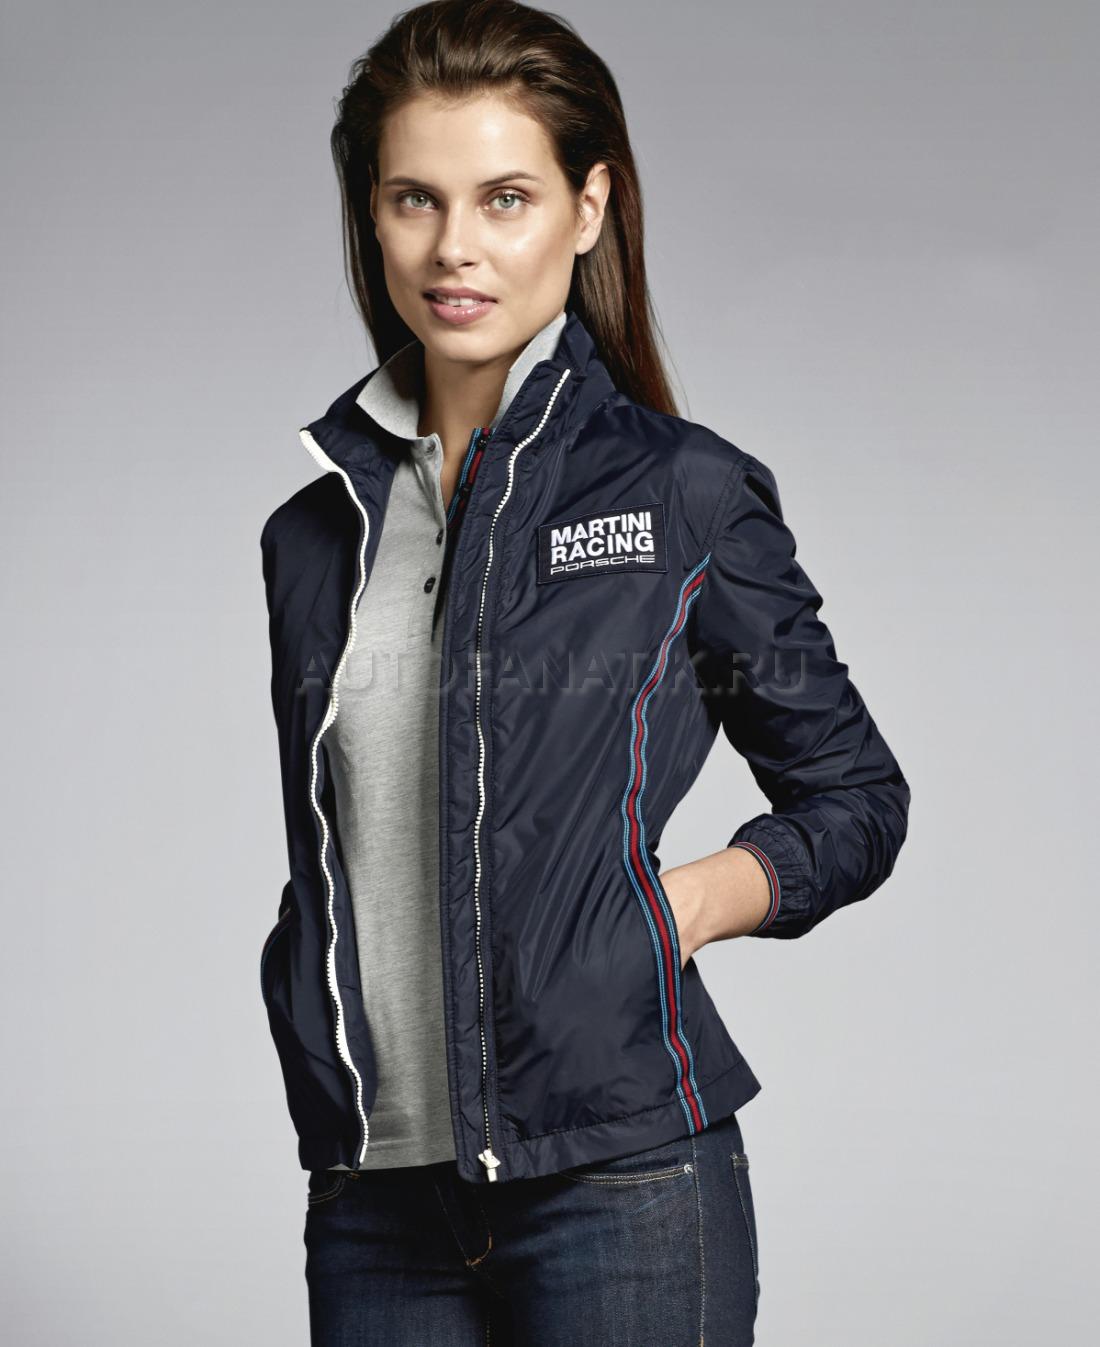 Женская ветровка Porsche Women S Windbreaker Jacket